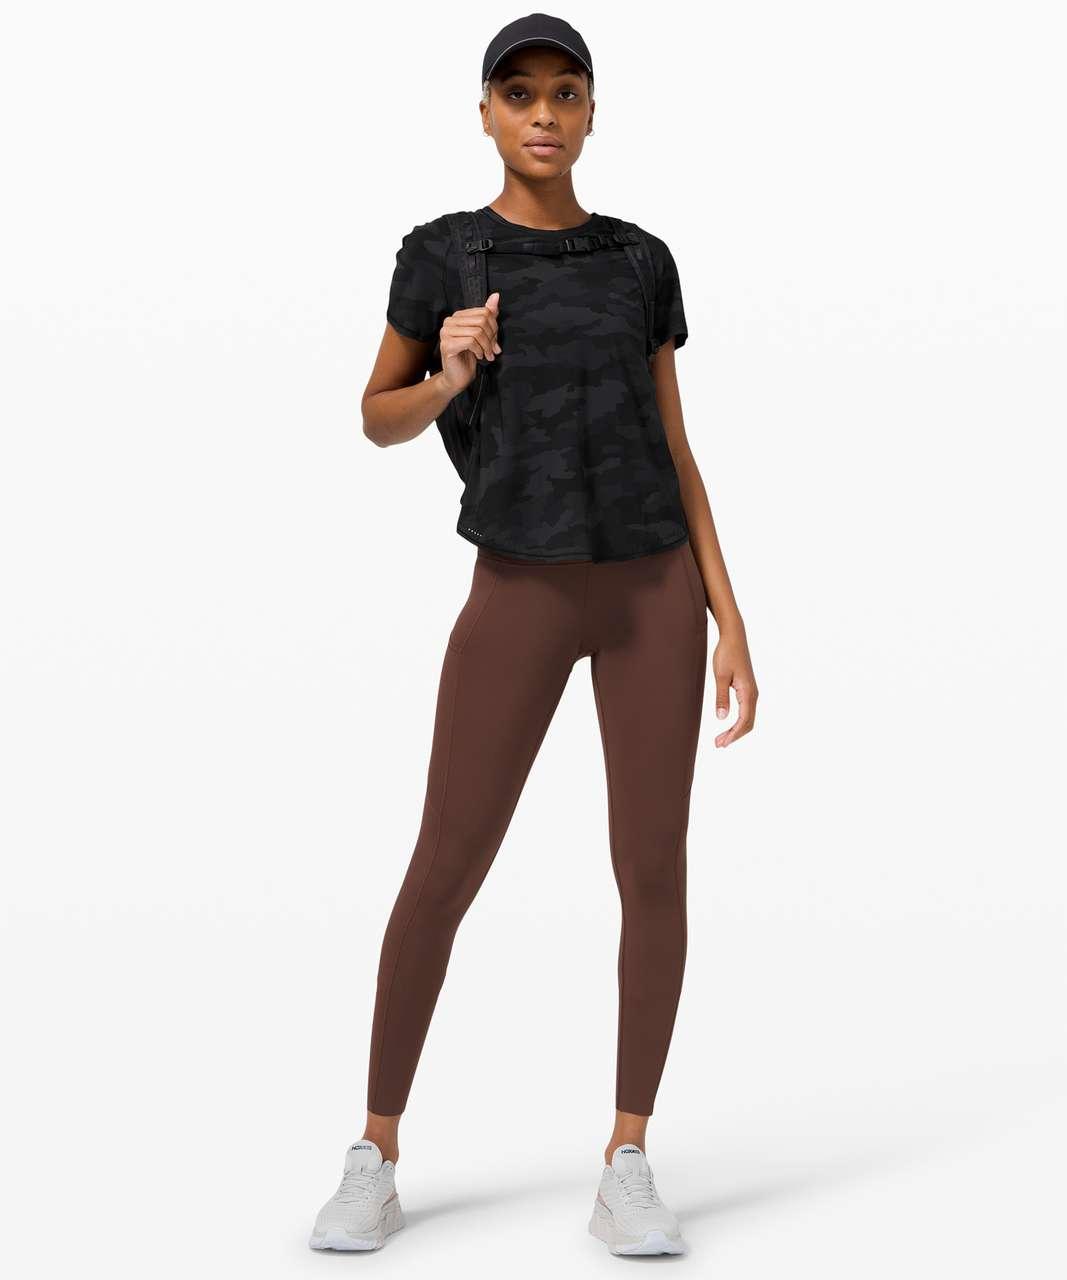 Lululemon Rise and Run Short Sleeve - Heritage 365 Camo Deep Coal Multi